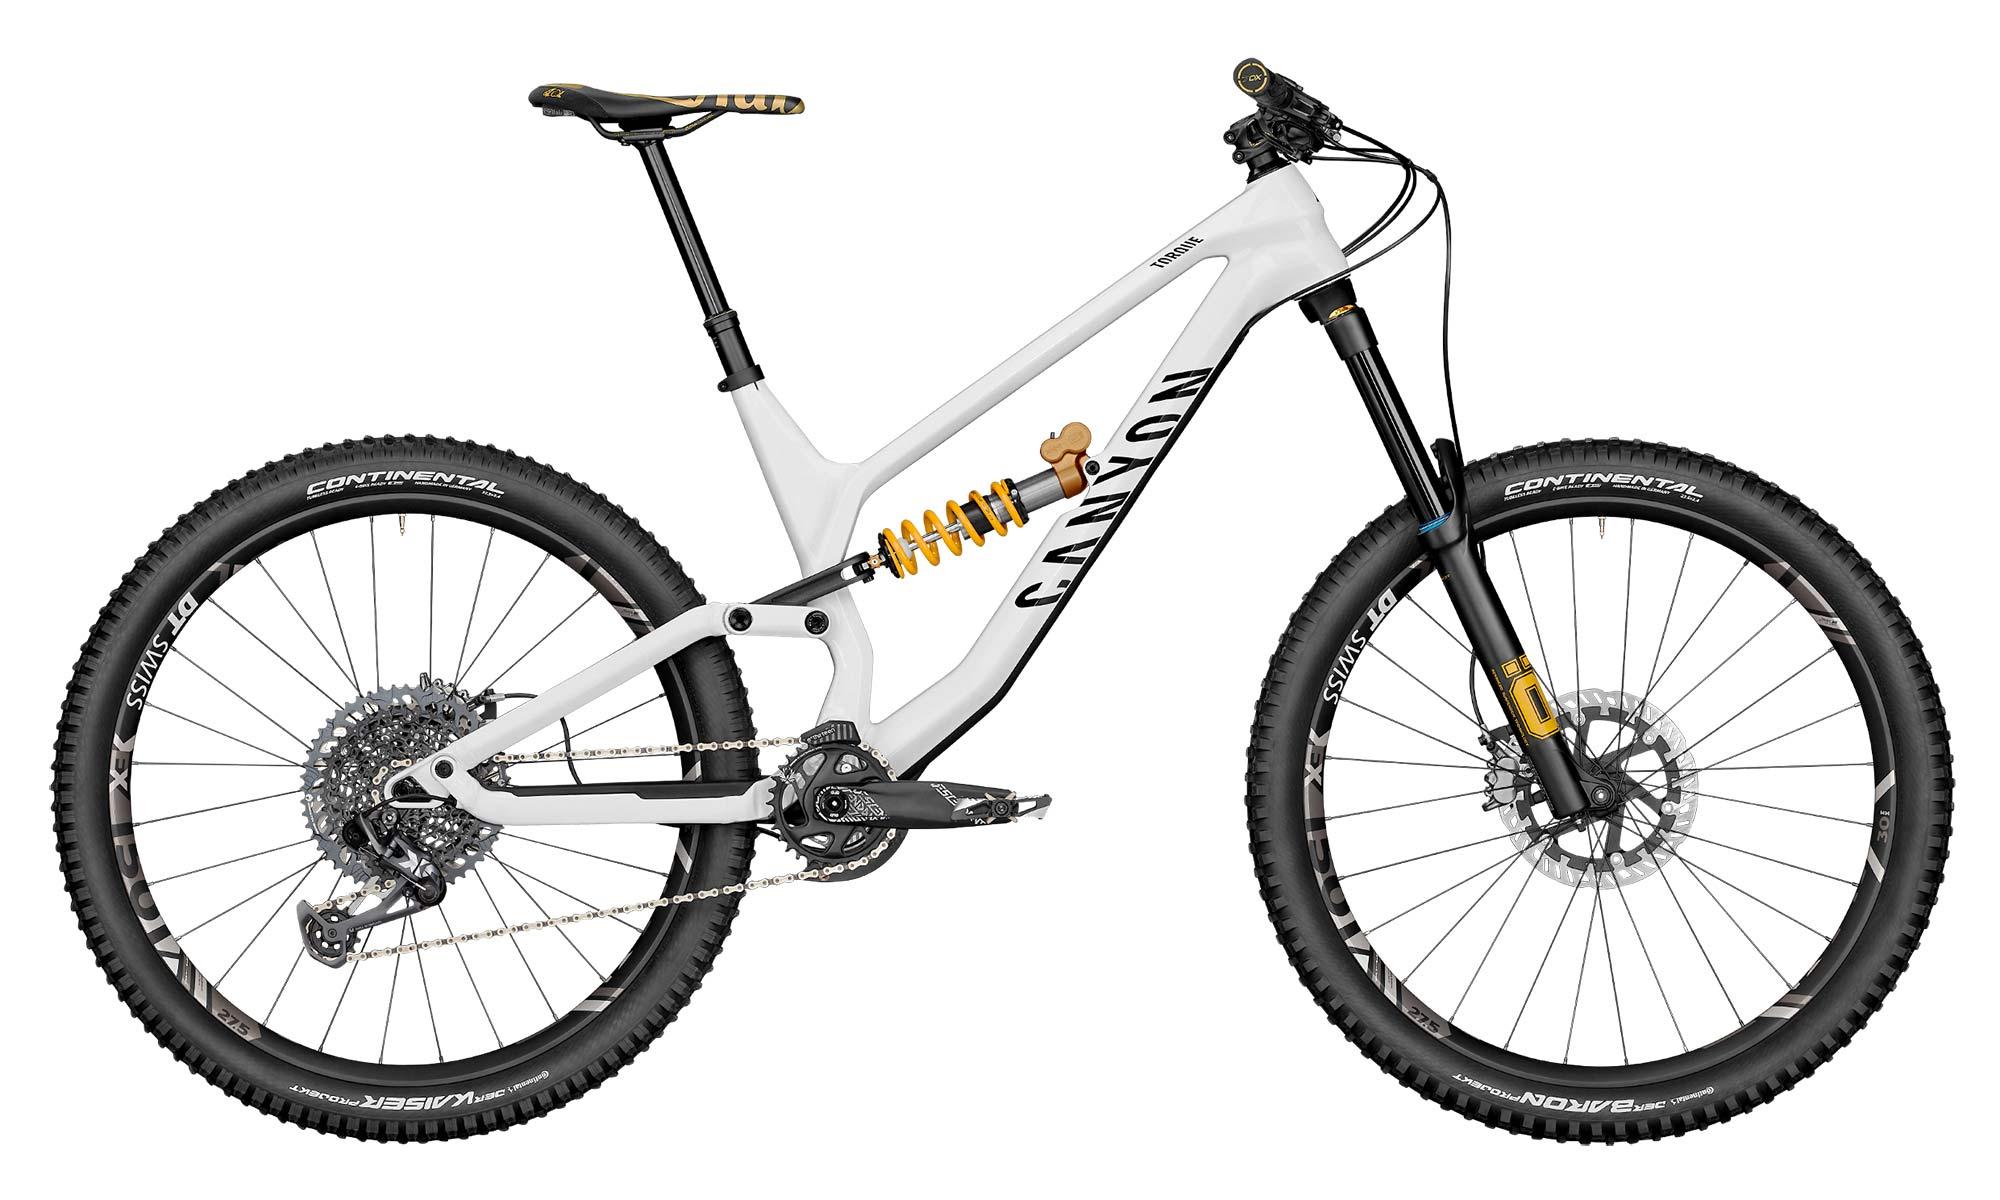 Canyon Torque CF Fabio Wibmer Signature Edition limited pro carbon freeride enduro bike,complete